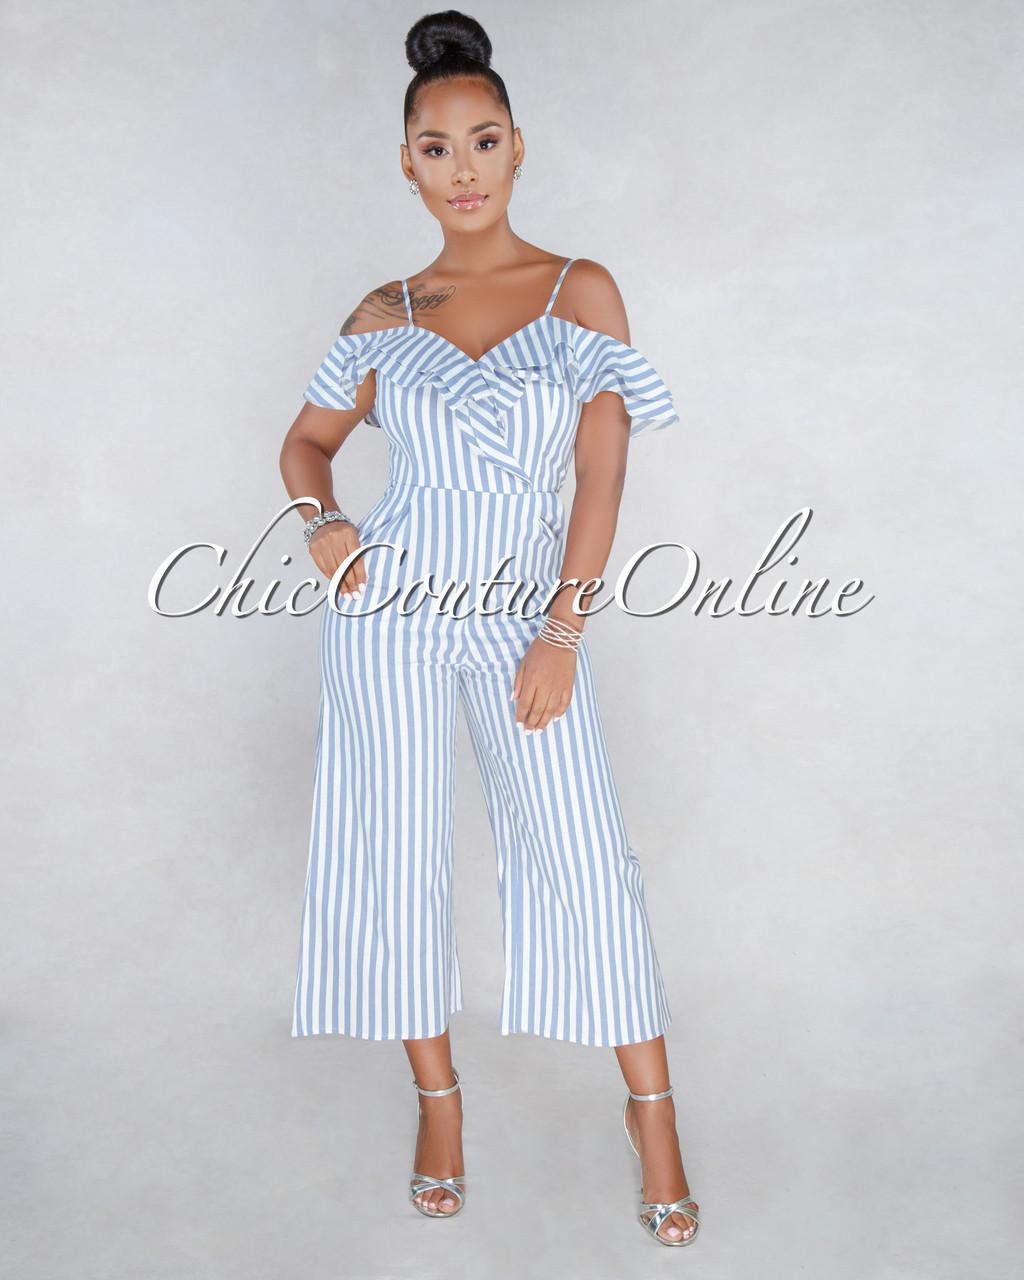 93ab6e3e65a Rhett Blue White Stripes Print Jumpsuit. Price   50.00. Image 1